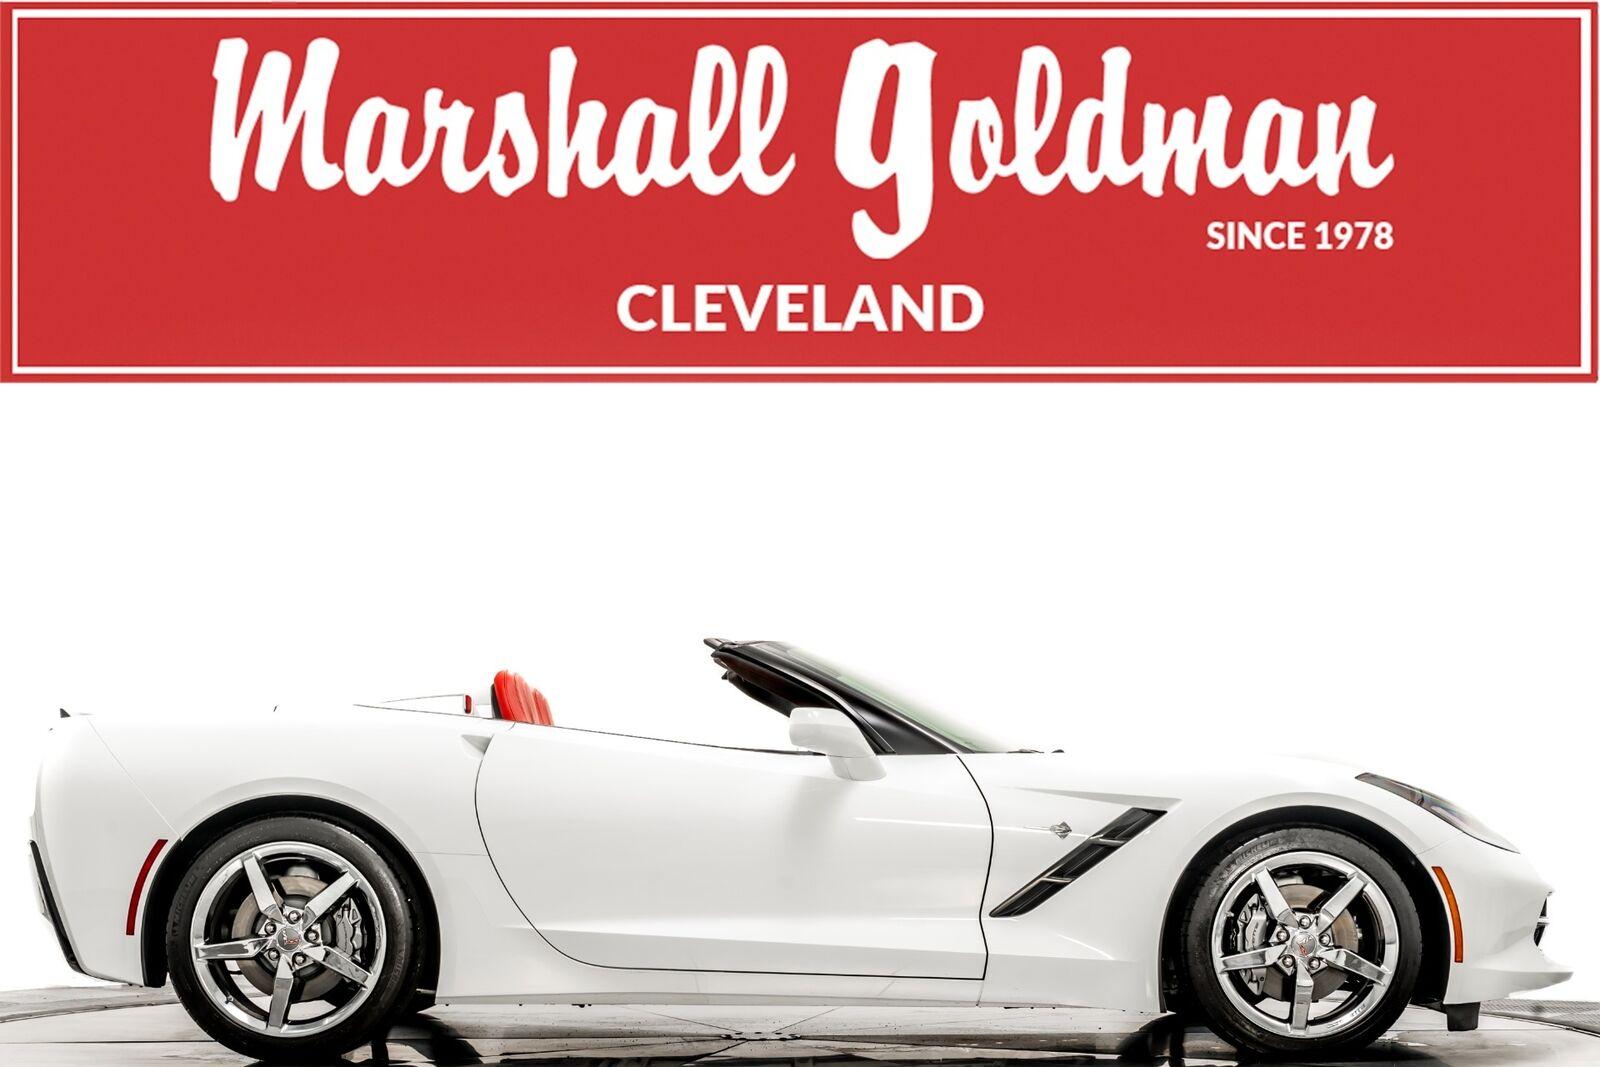 2015 White Chevrolet Corvette Convertible 3LT   C7 Corvette Photo 1